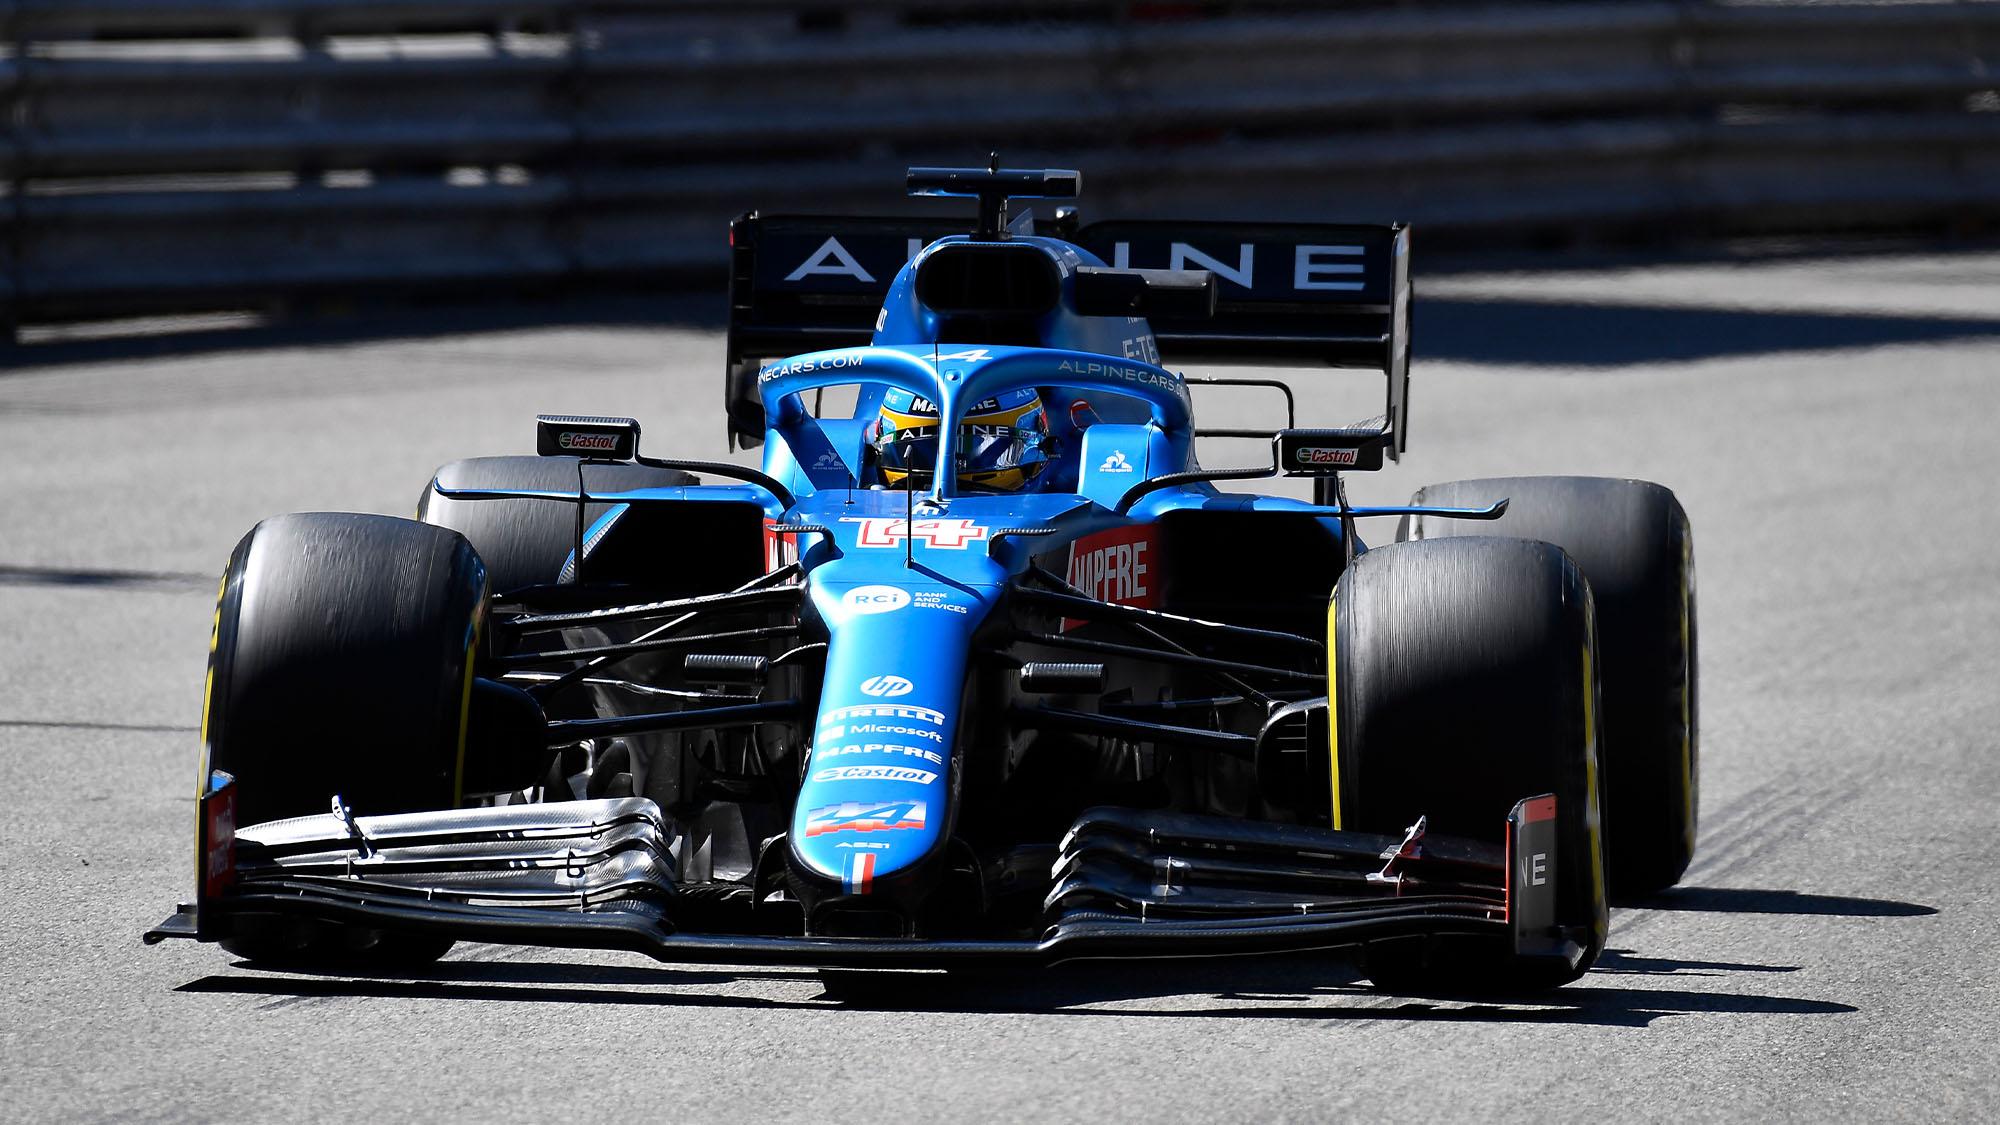 Alonso Monaco 2021